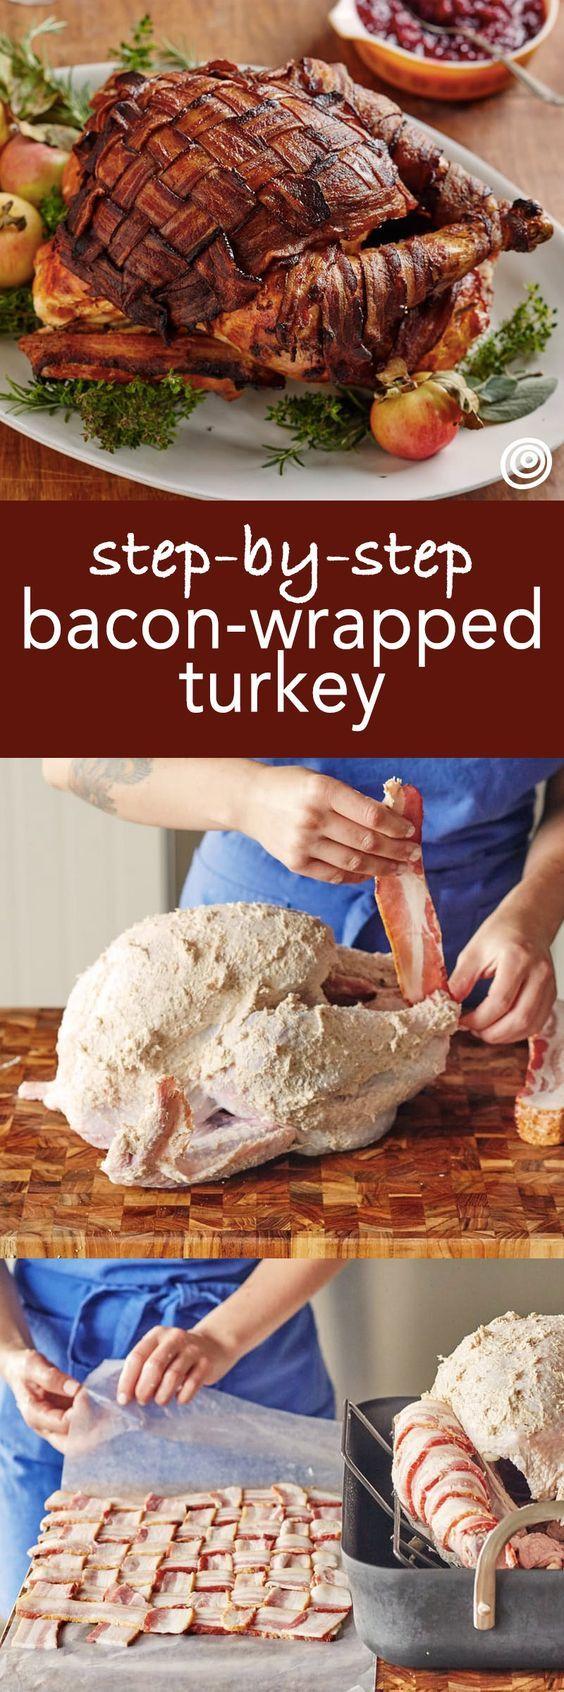 How To Make a Bacon-Wrapped Turkey | Recipe | Turkey ...